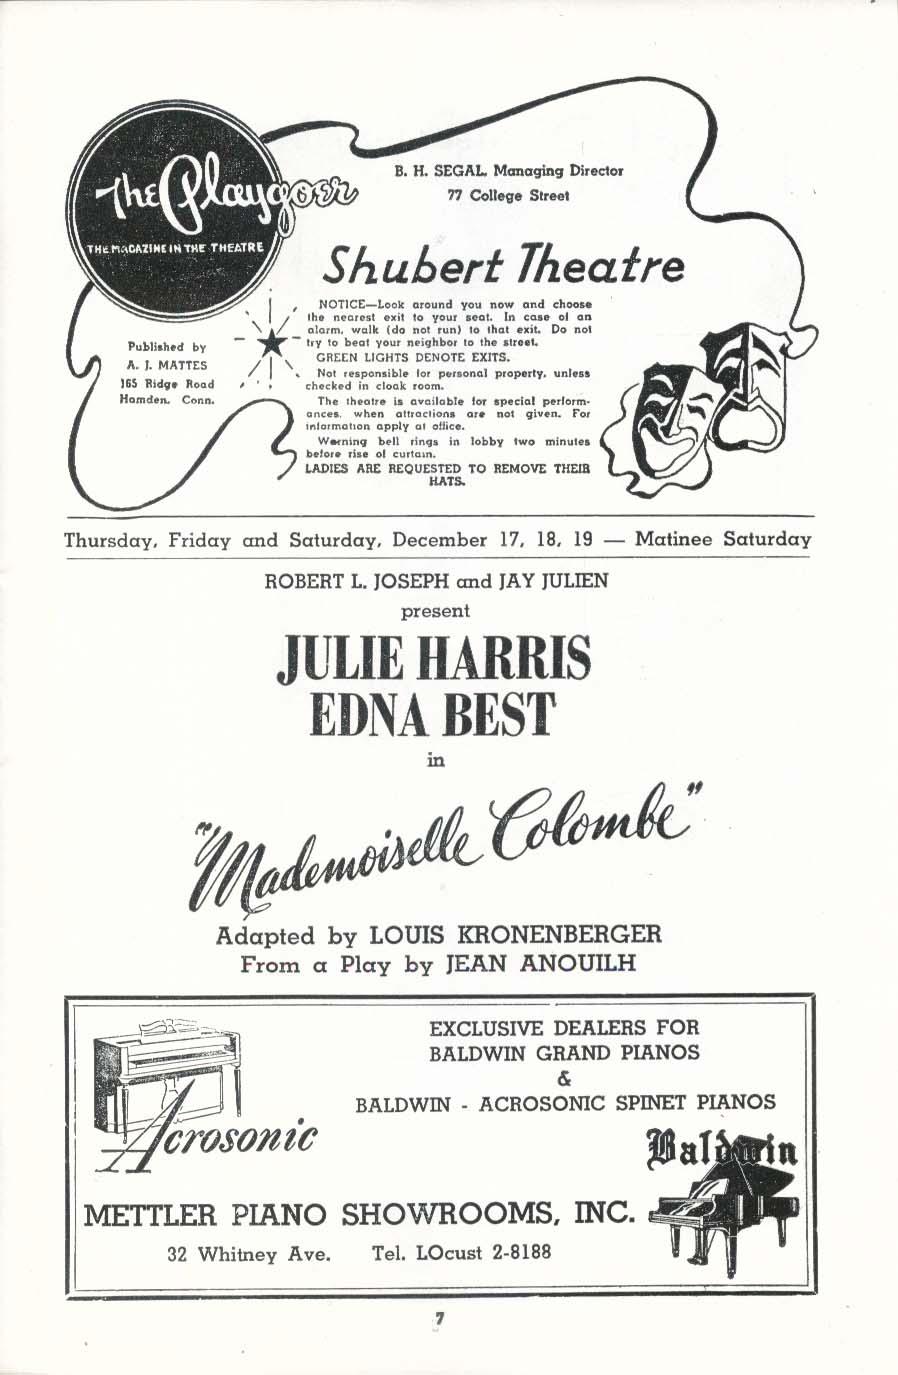 Shubert Theatre New Haven program Mademoiselle Colombe 1953 pre-Broadway